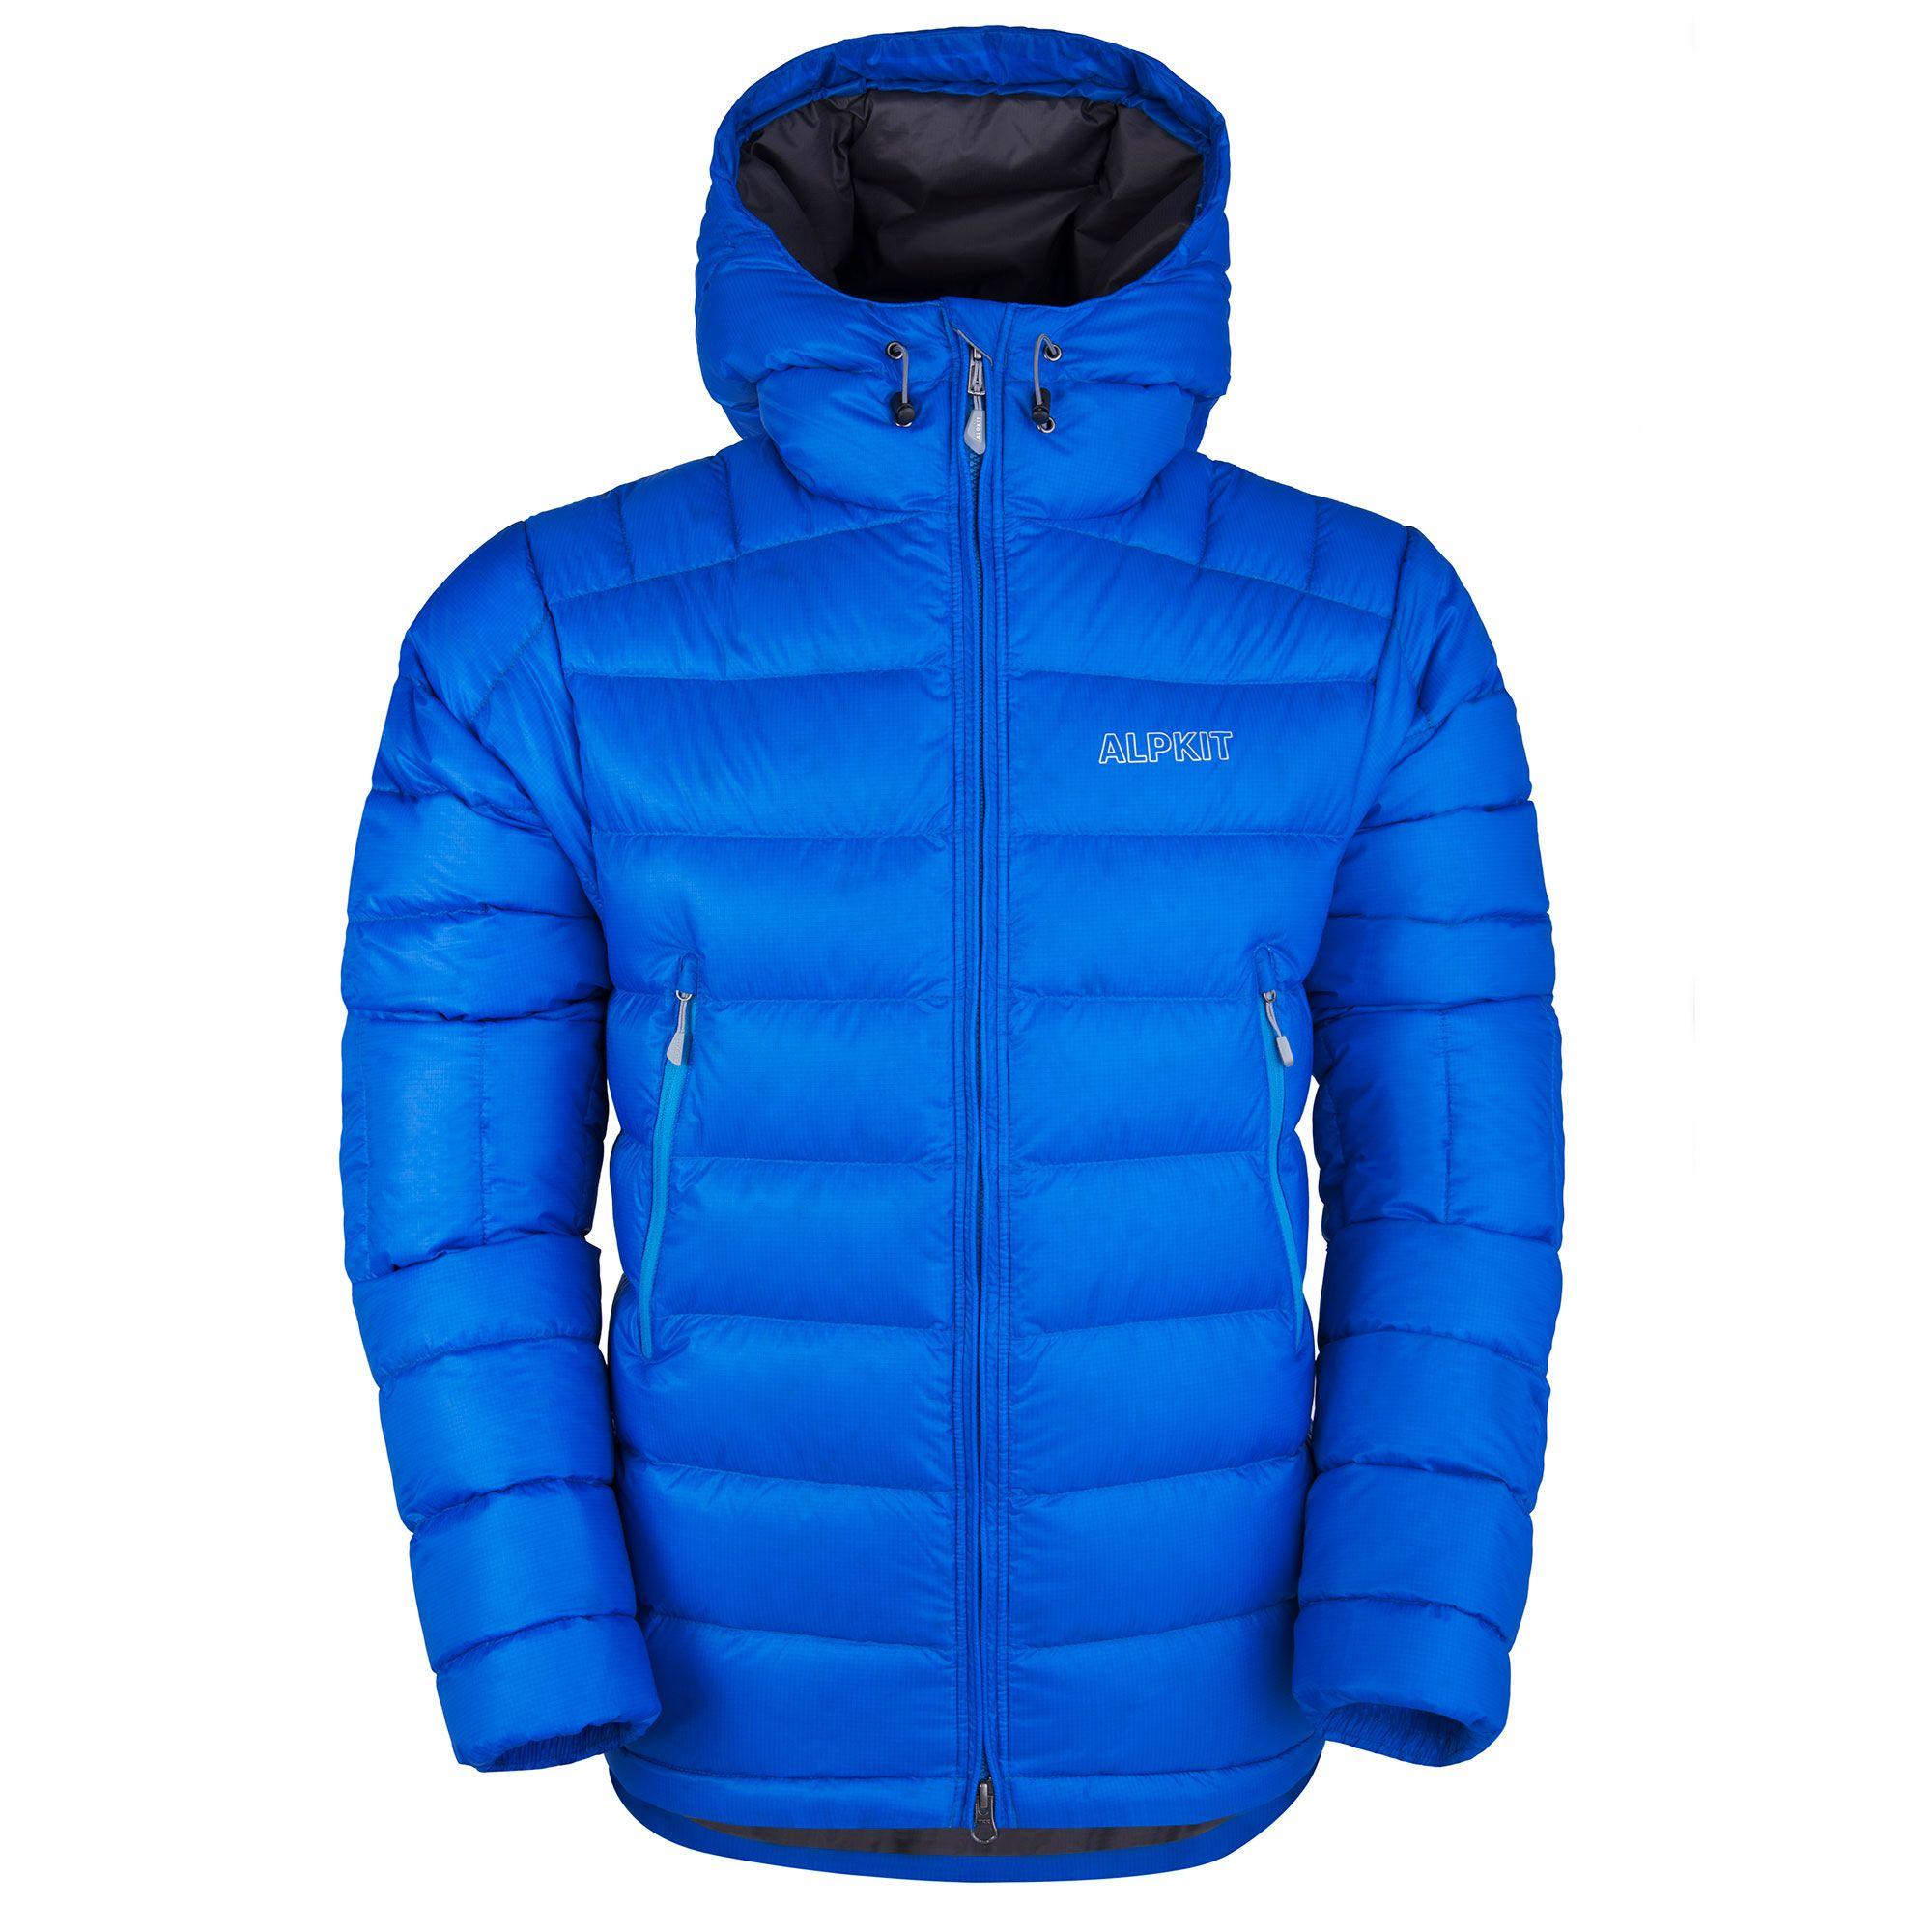 ad7ac127445 Phantac Mens Hydrophobic goose down jacket | Fashion | Jackets ...